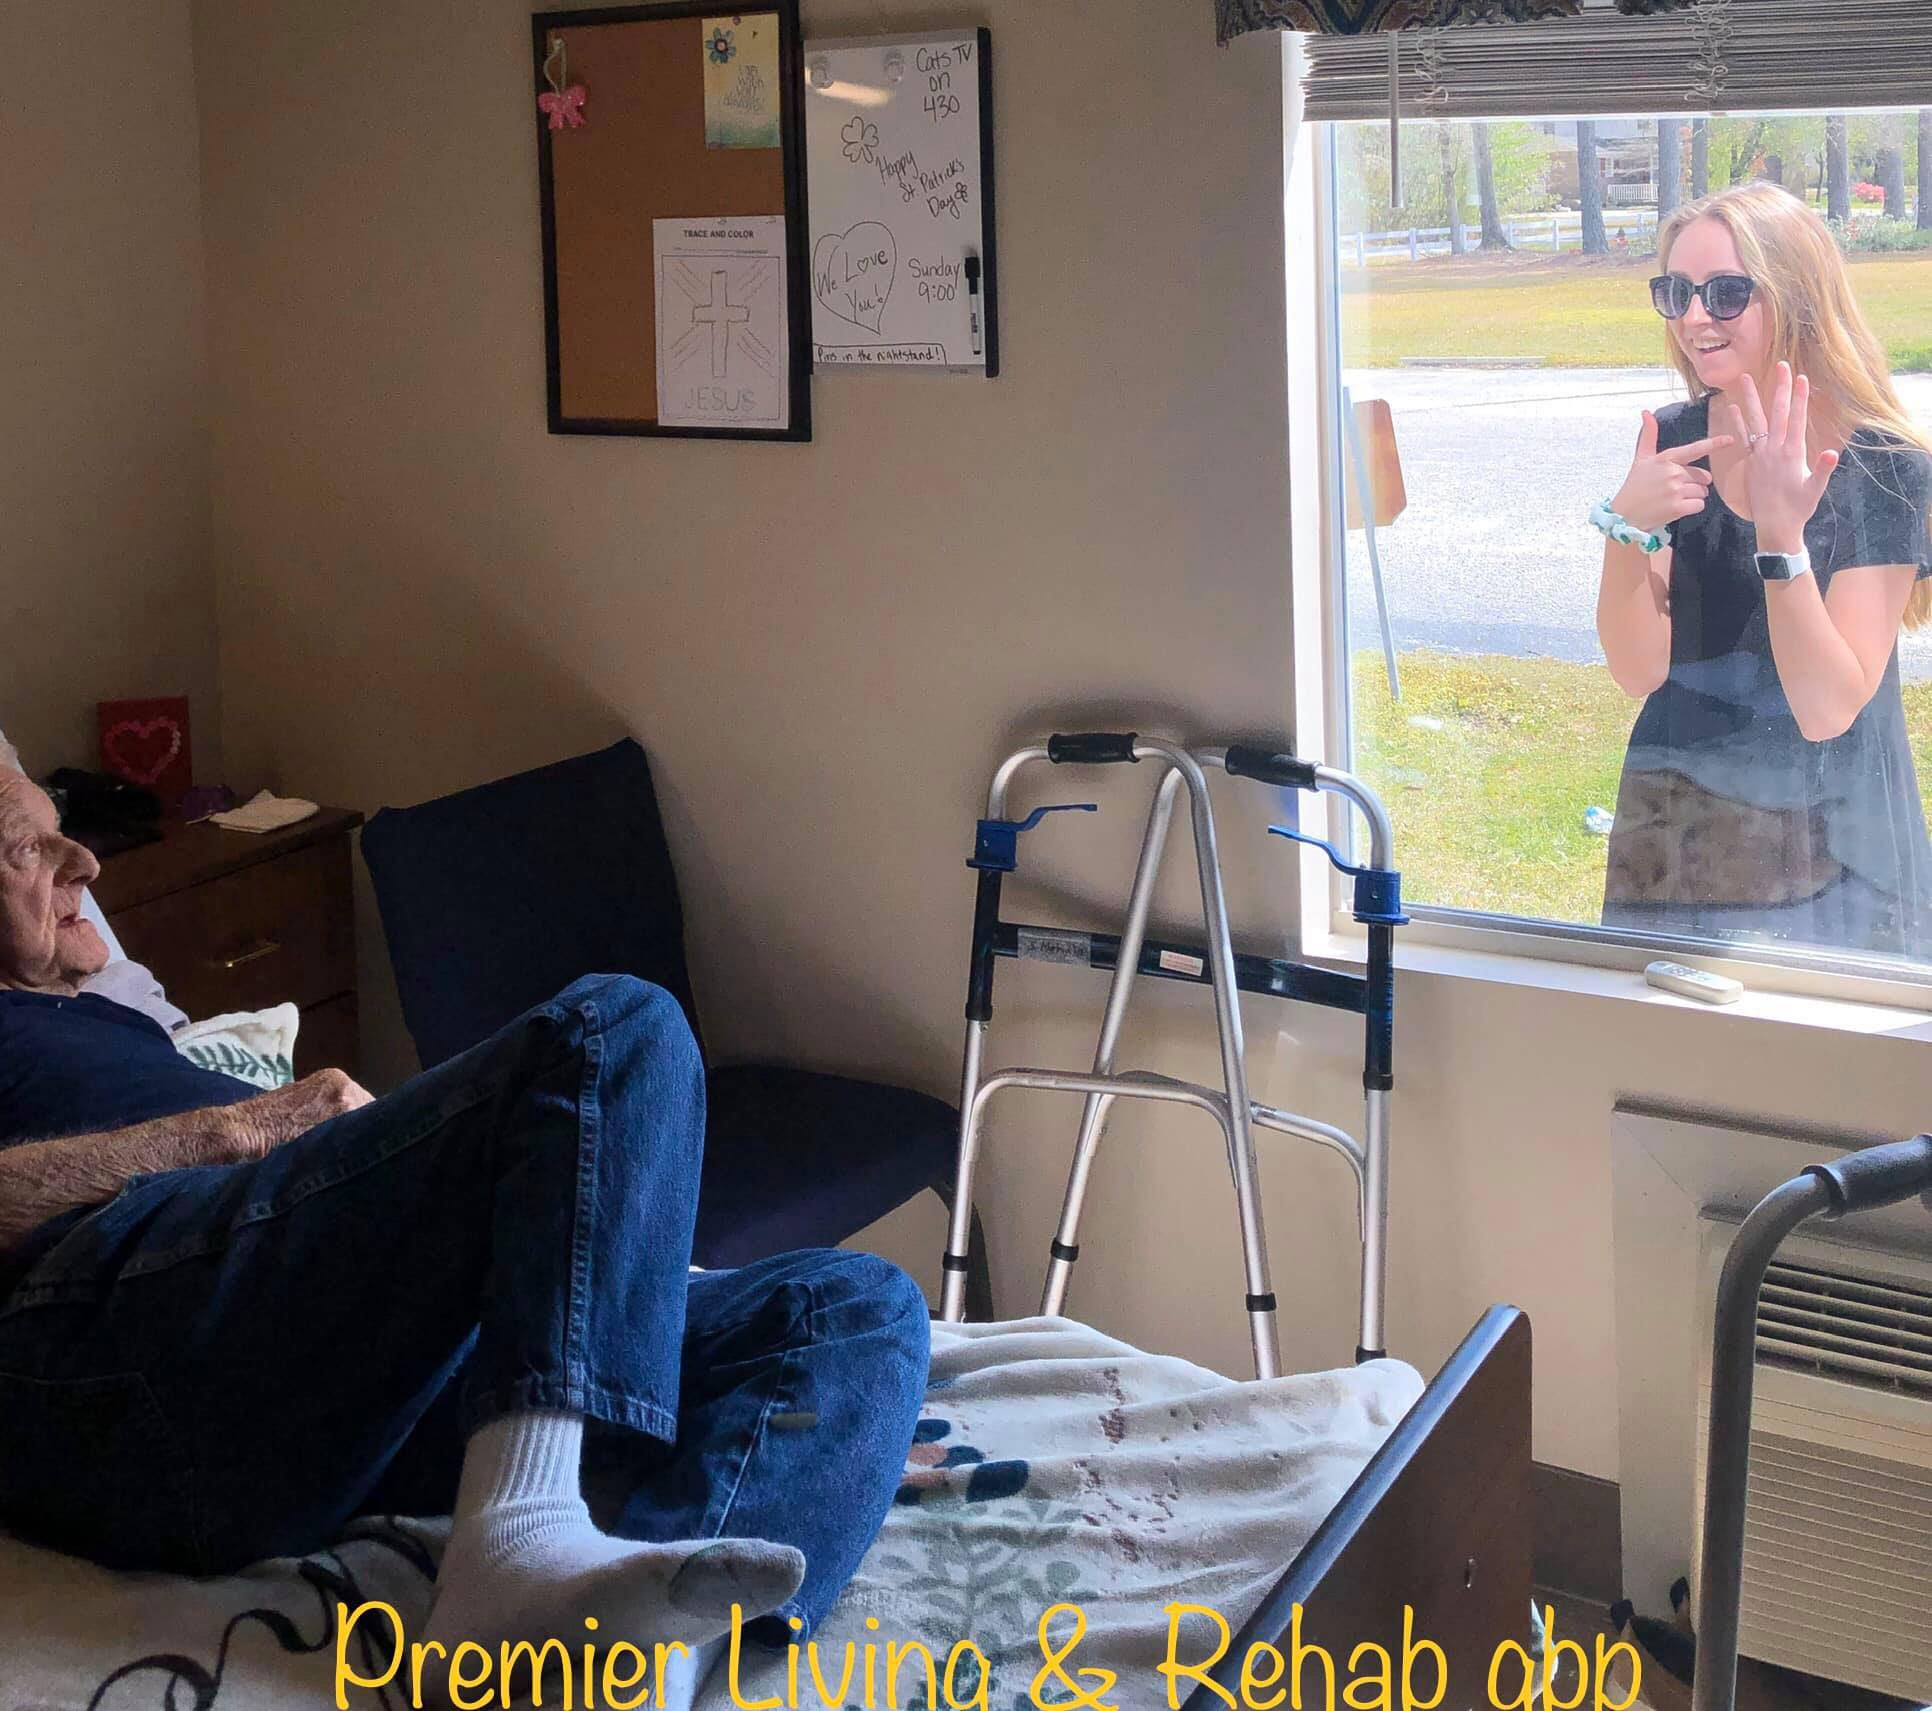 Woman Tells Grandfather She's Engaged Through Window Amid Coronavirus Pandemic